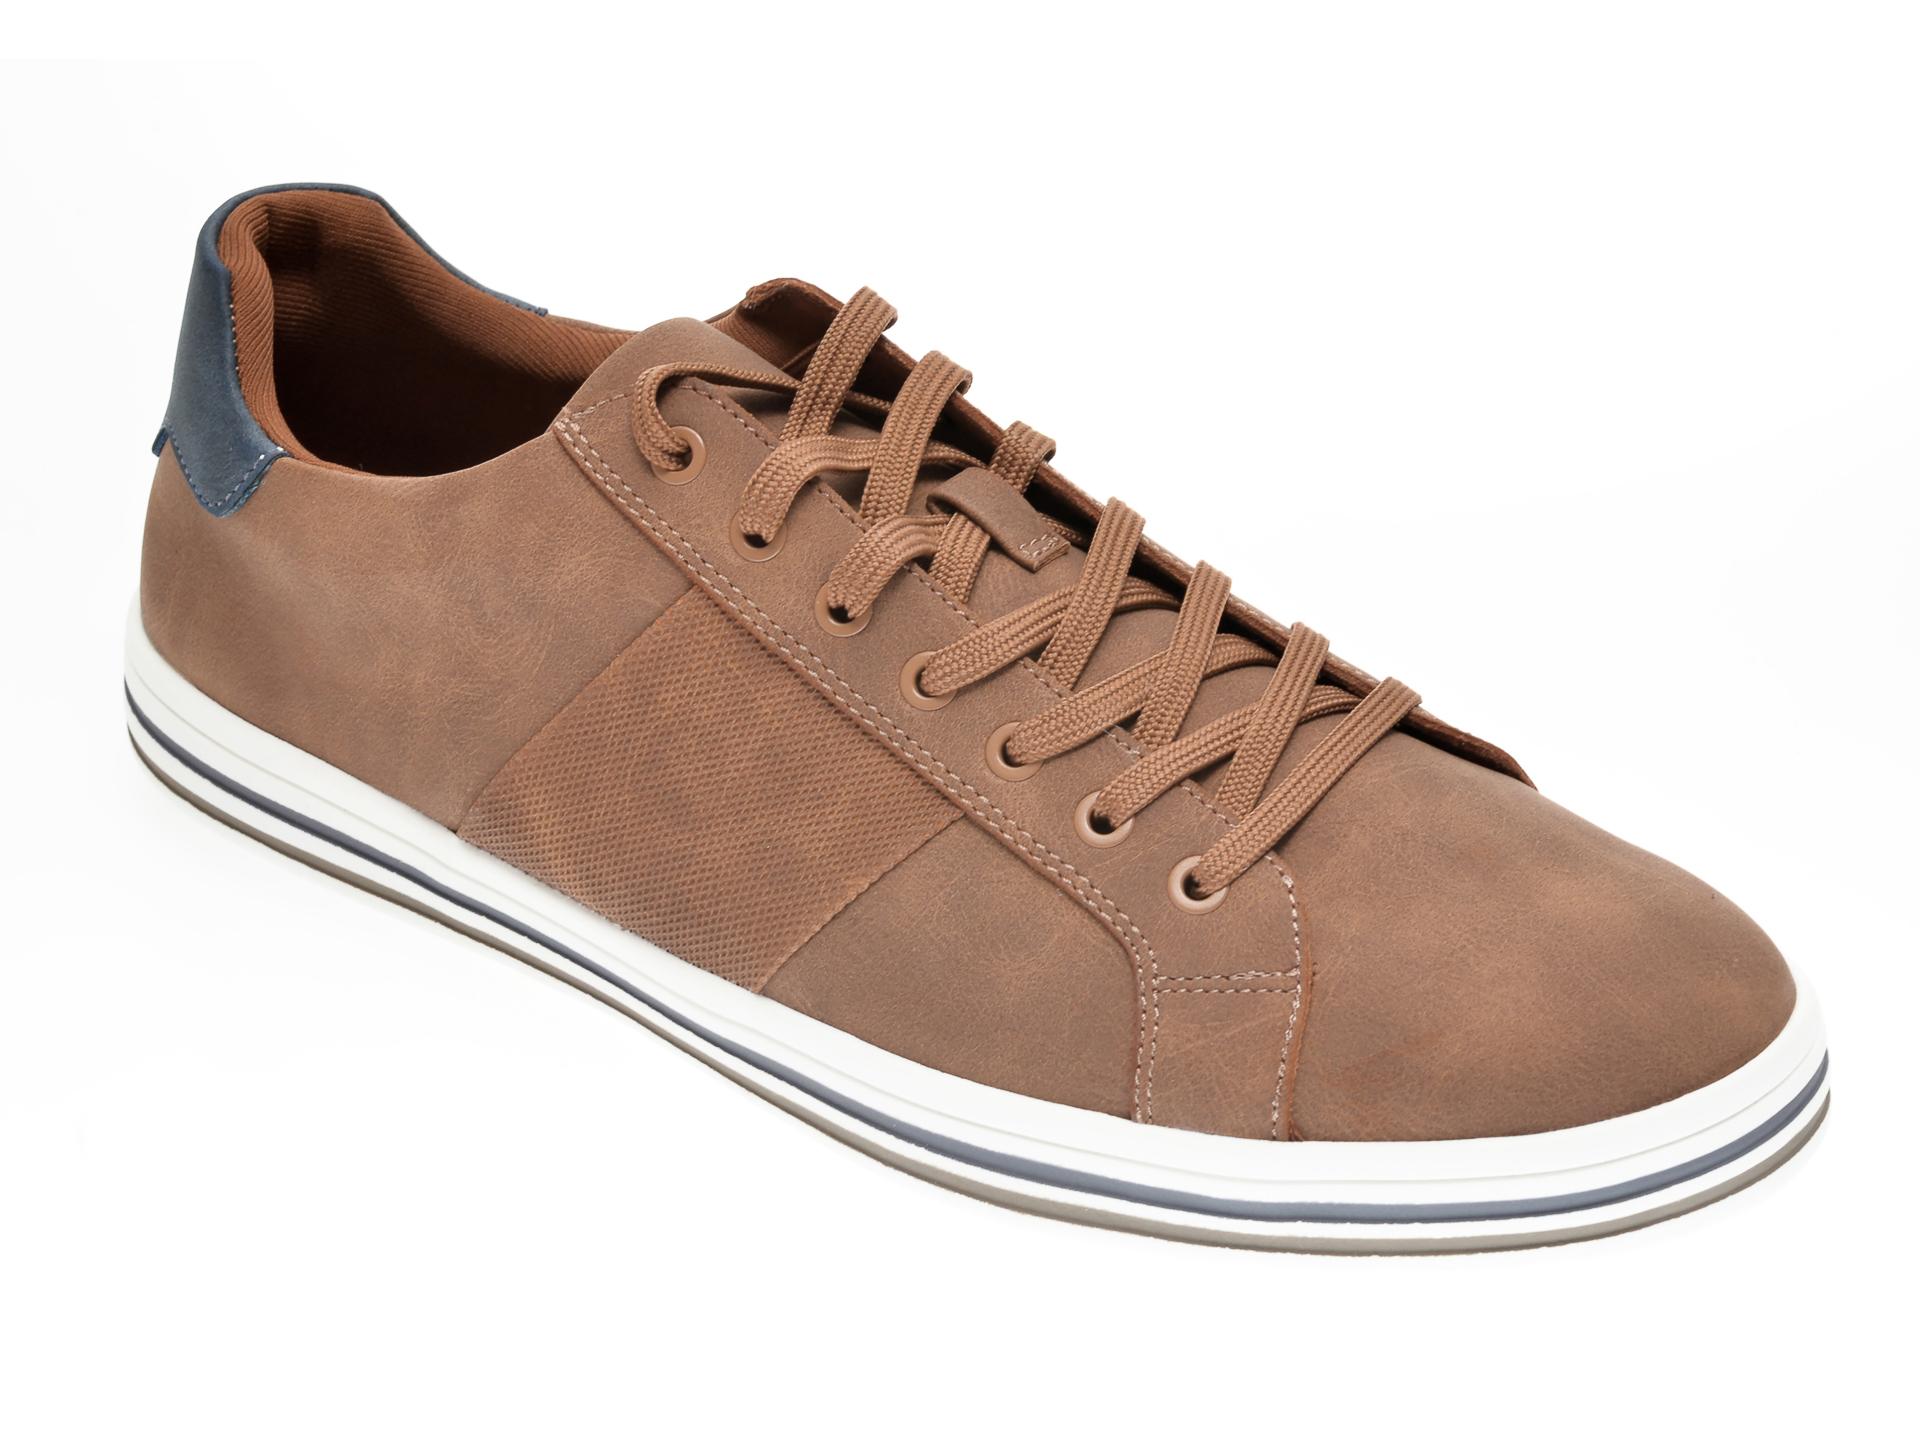 Pantofi ALDO maro, Eterrarwen220, din piele ecologica imagine